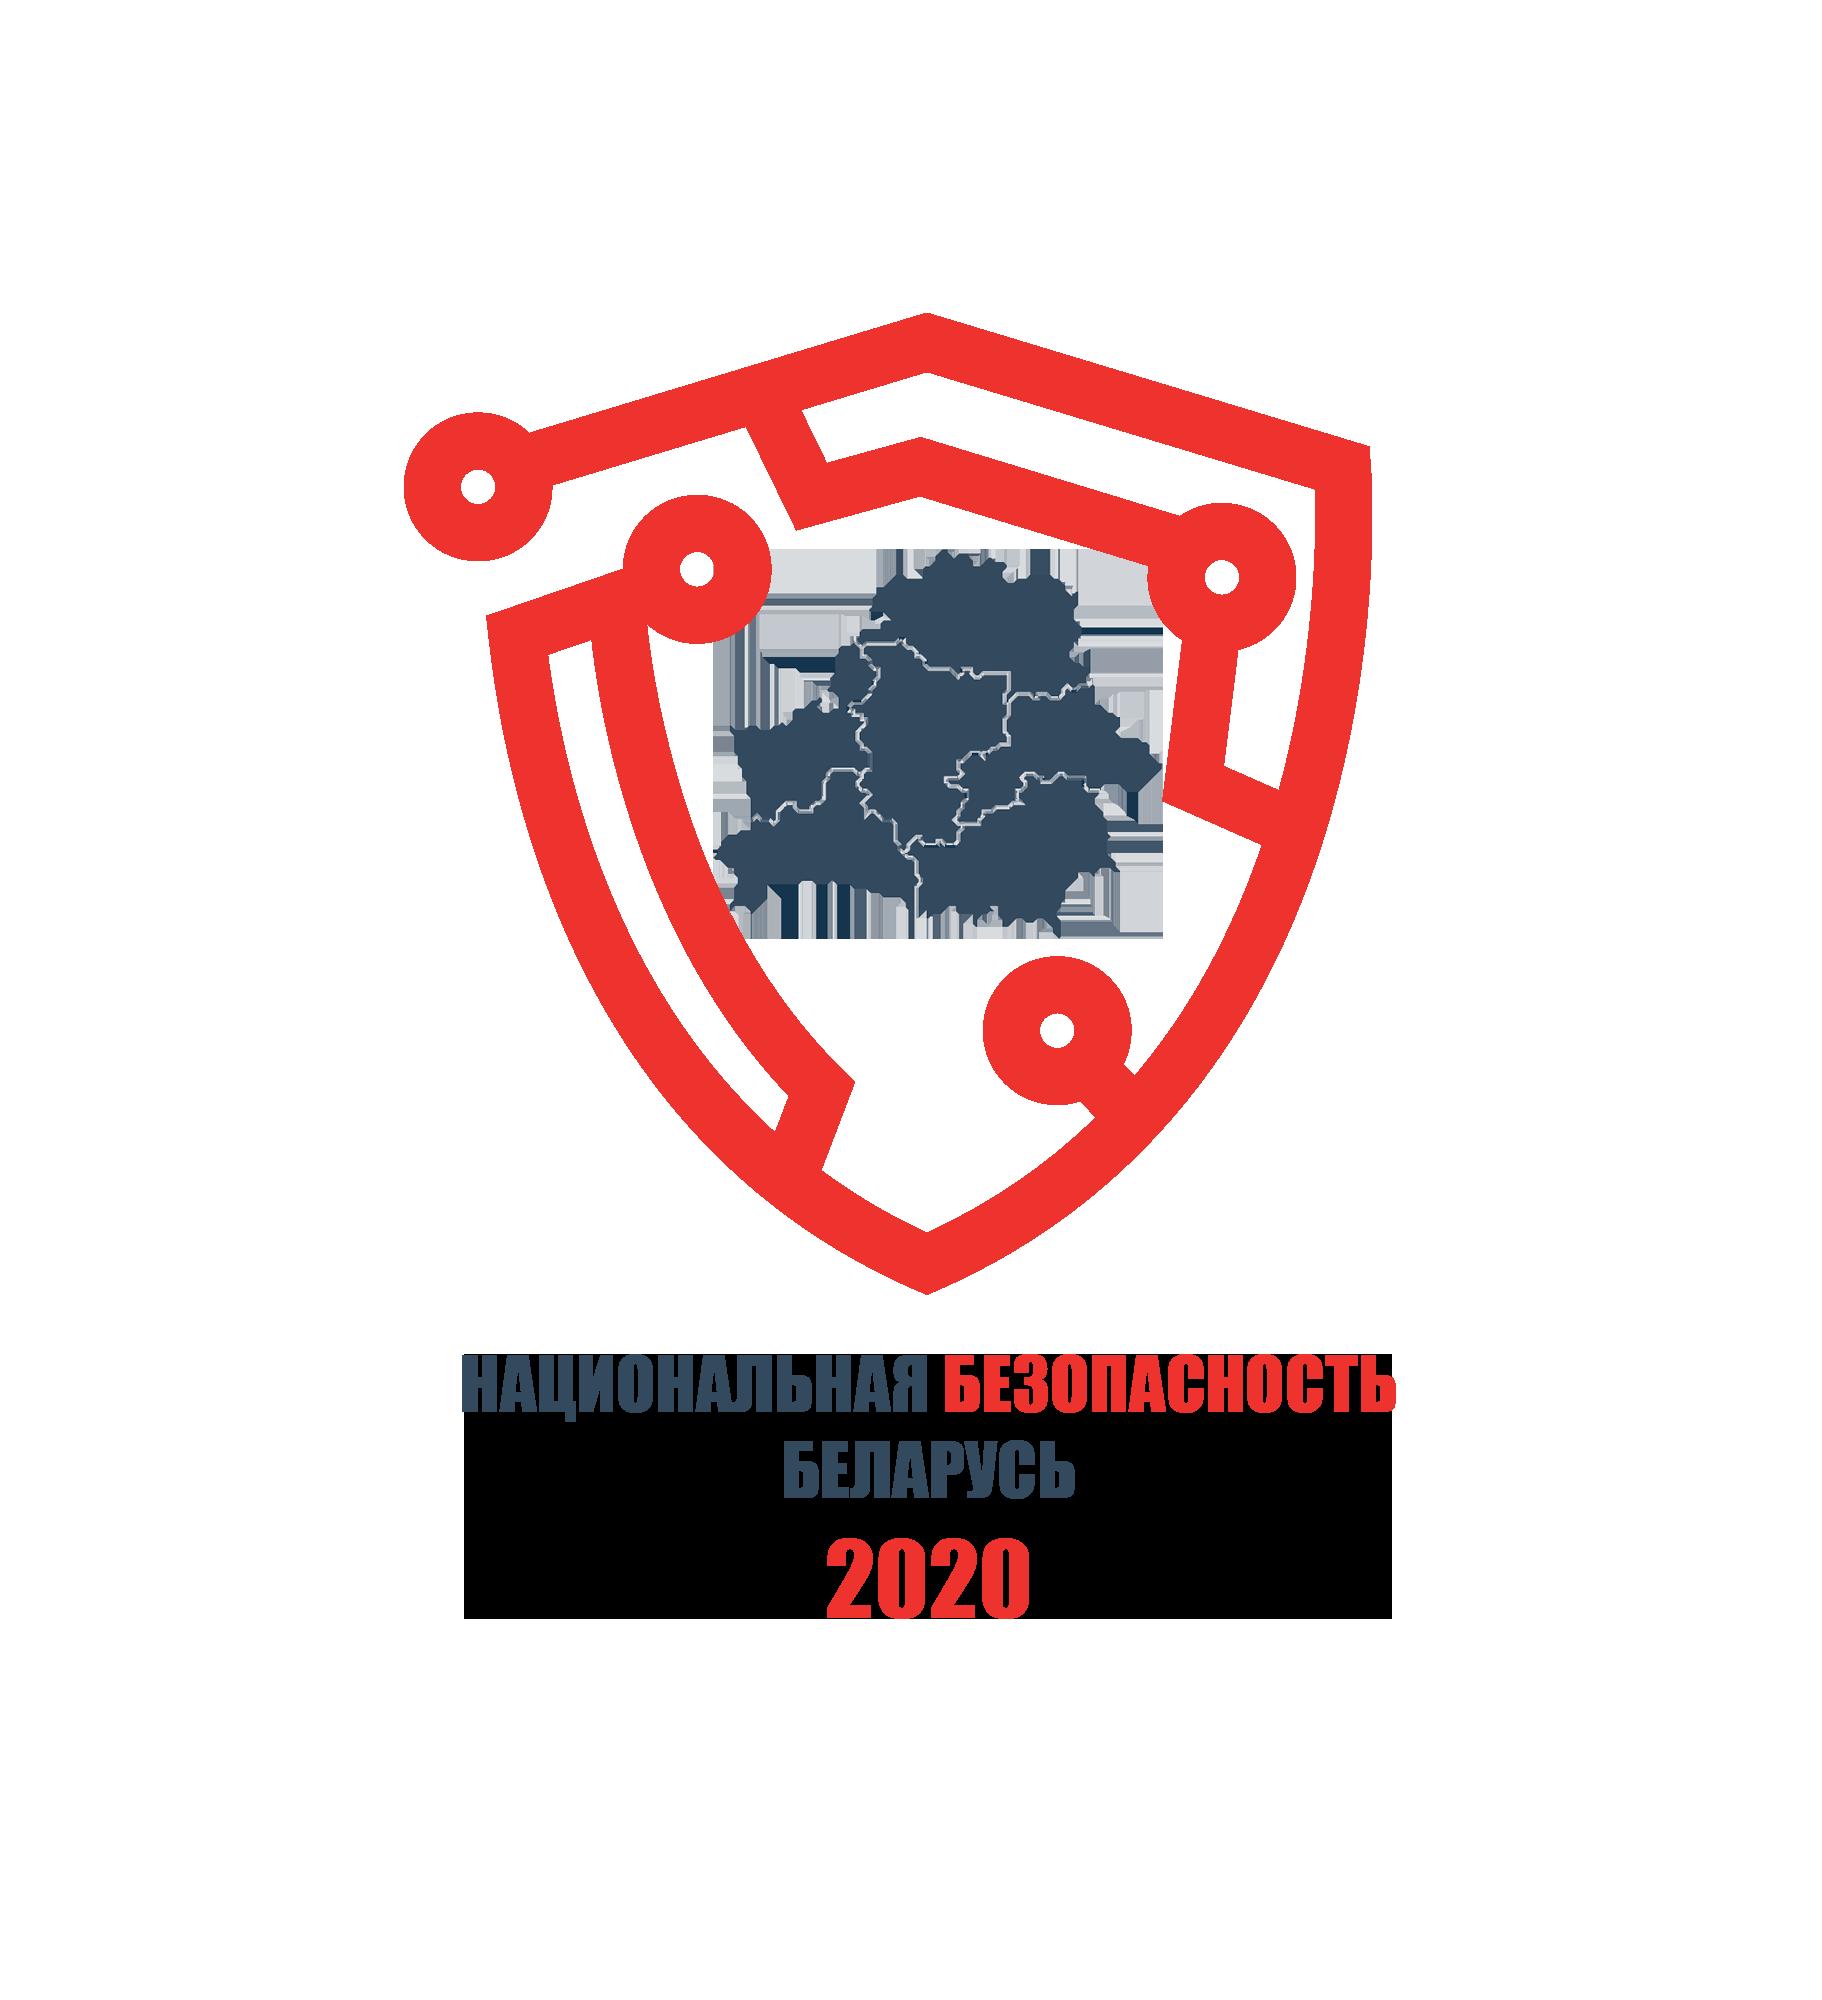 Нацбезопасность Беларусь 2020